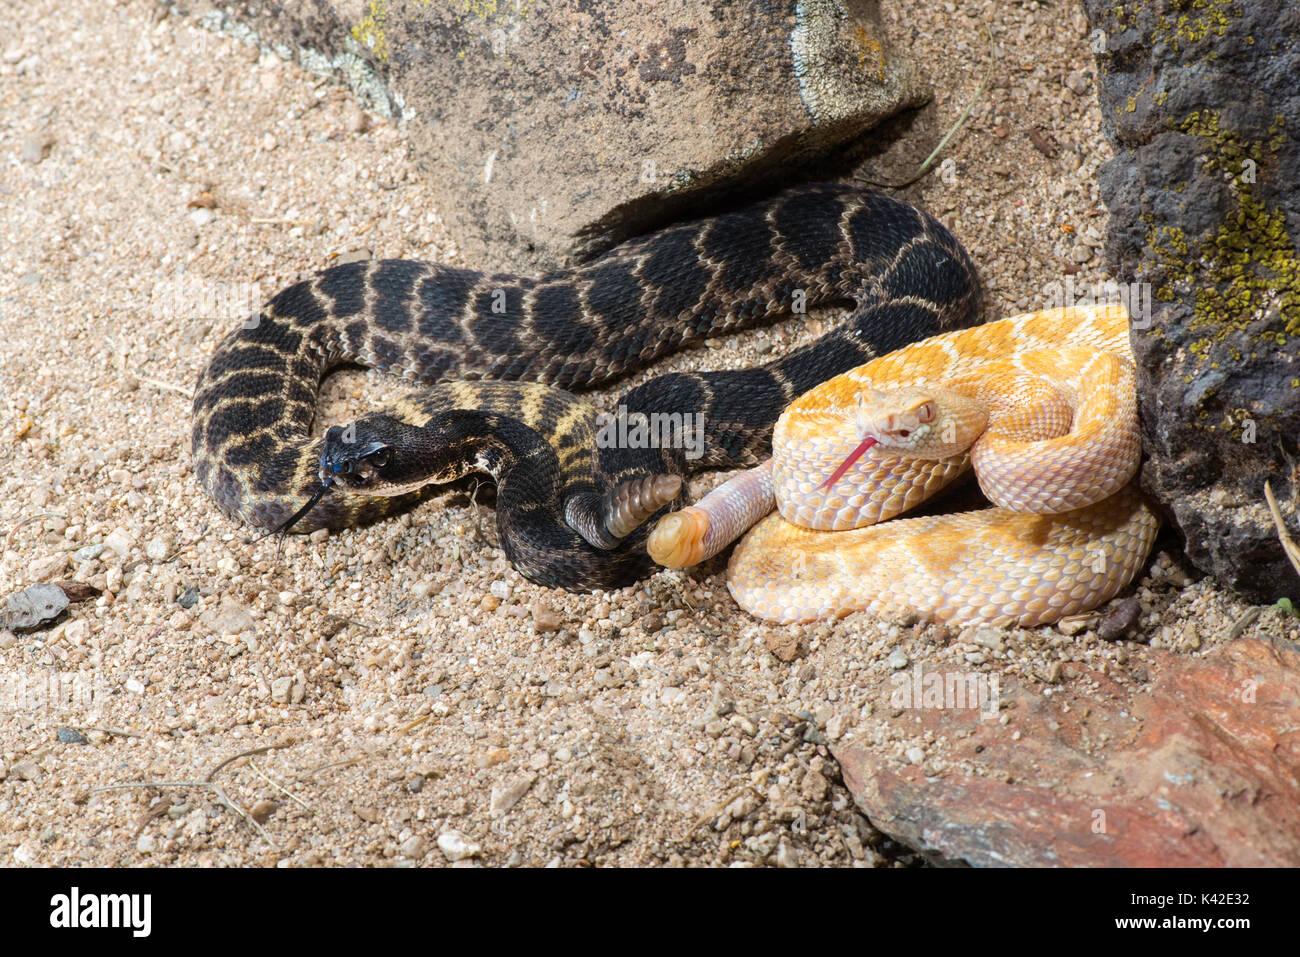 Western Diamondback Rattlesnake Crotalus atrox Tucson, Pima County, Arizona, United States 28 August 2017 Stock Photo